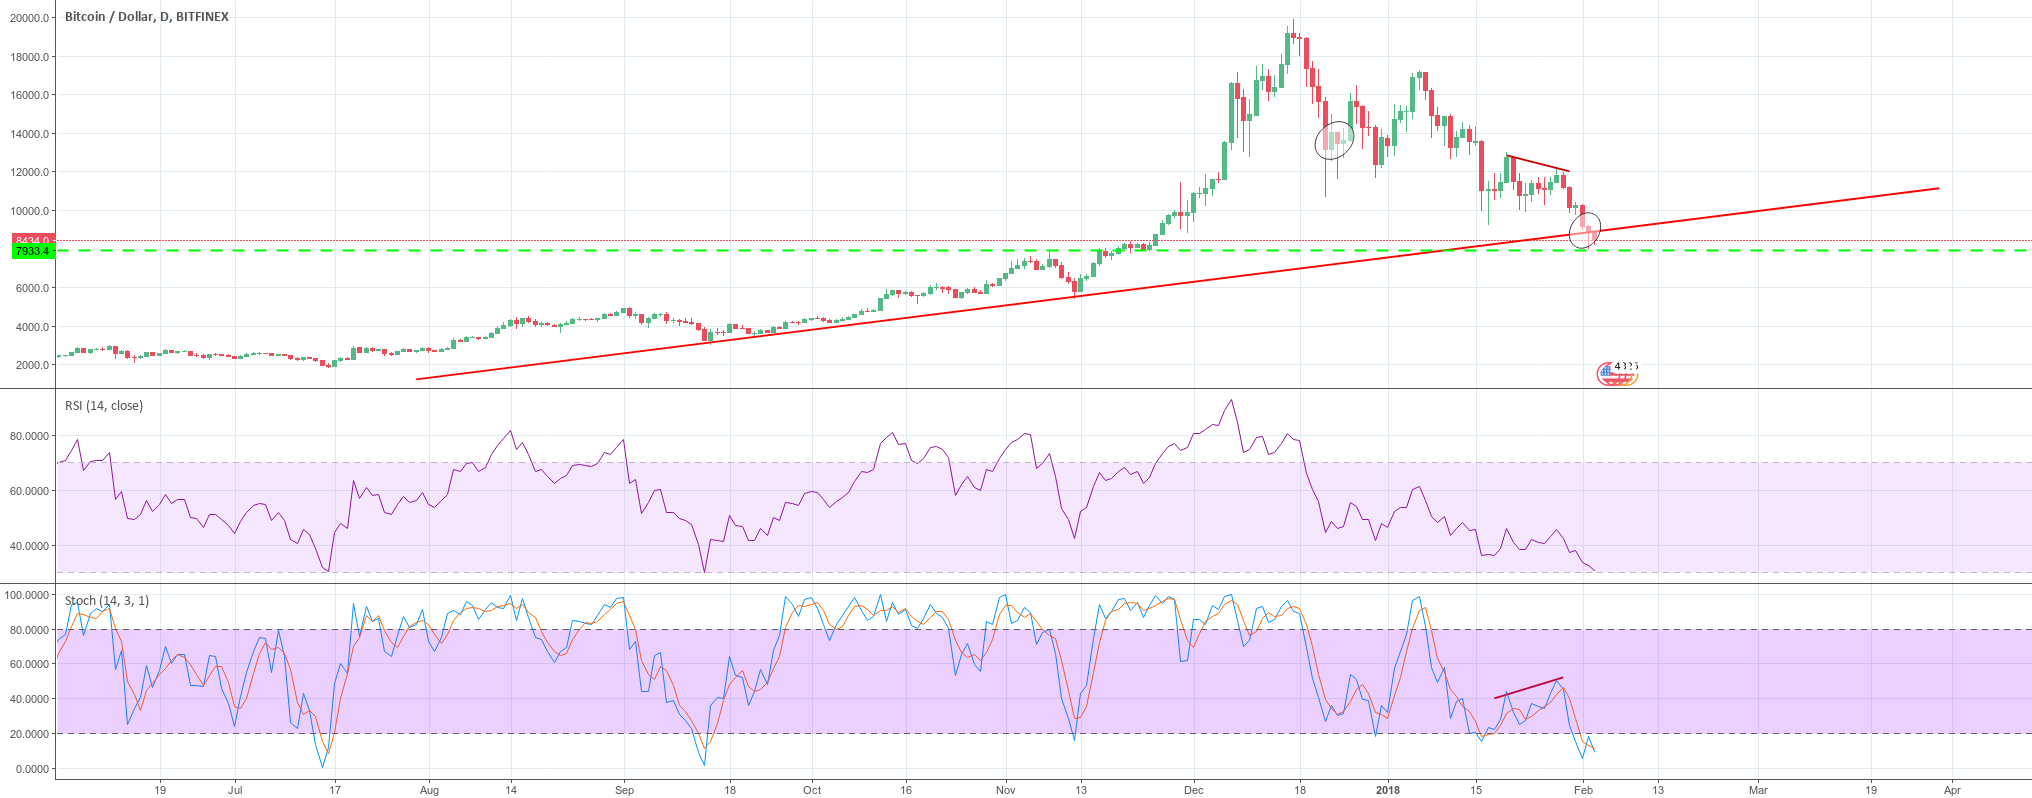 BTC short-term price recovery